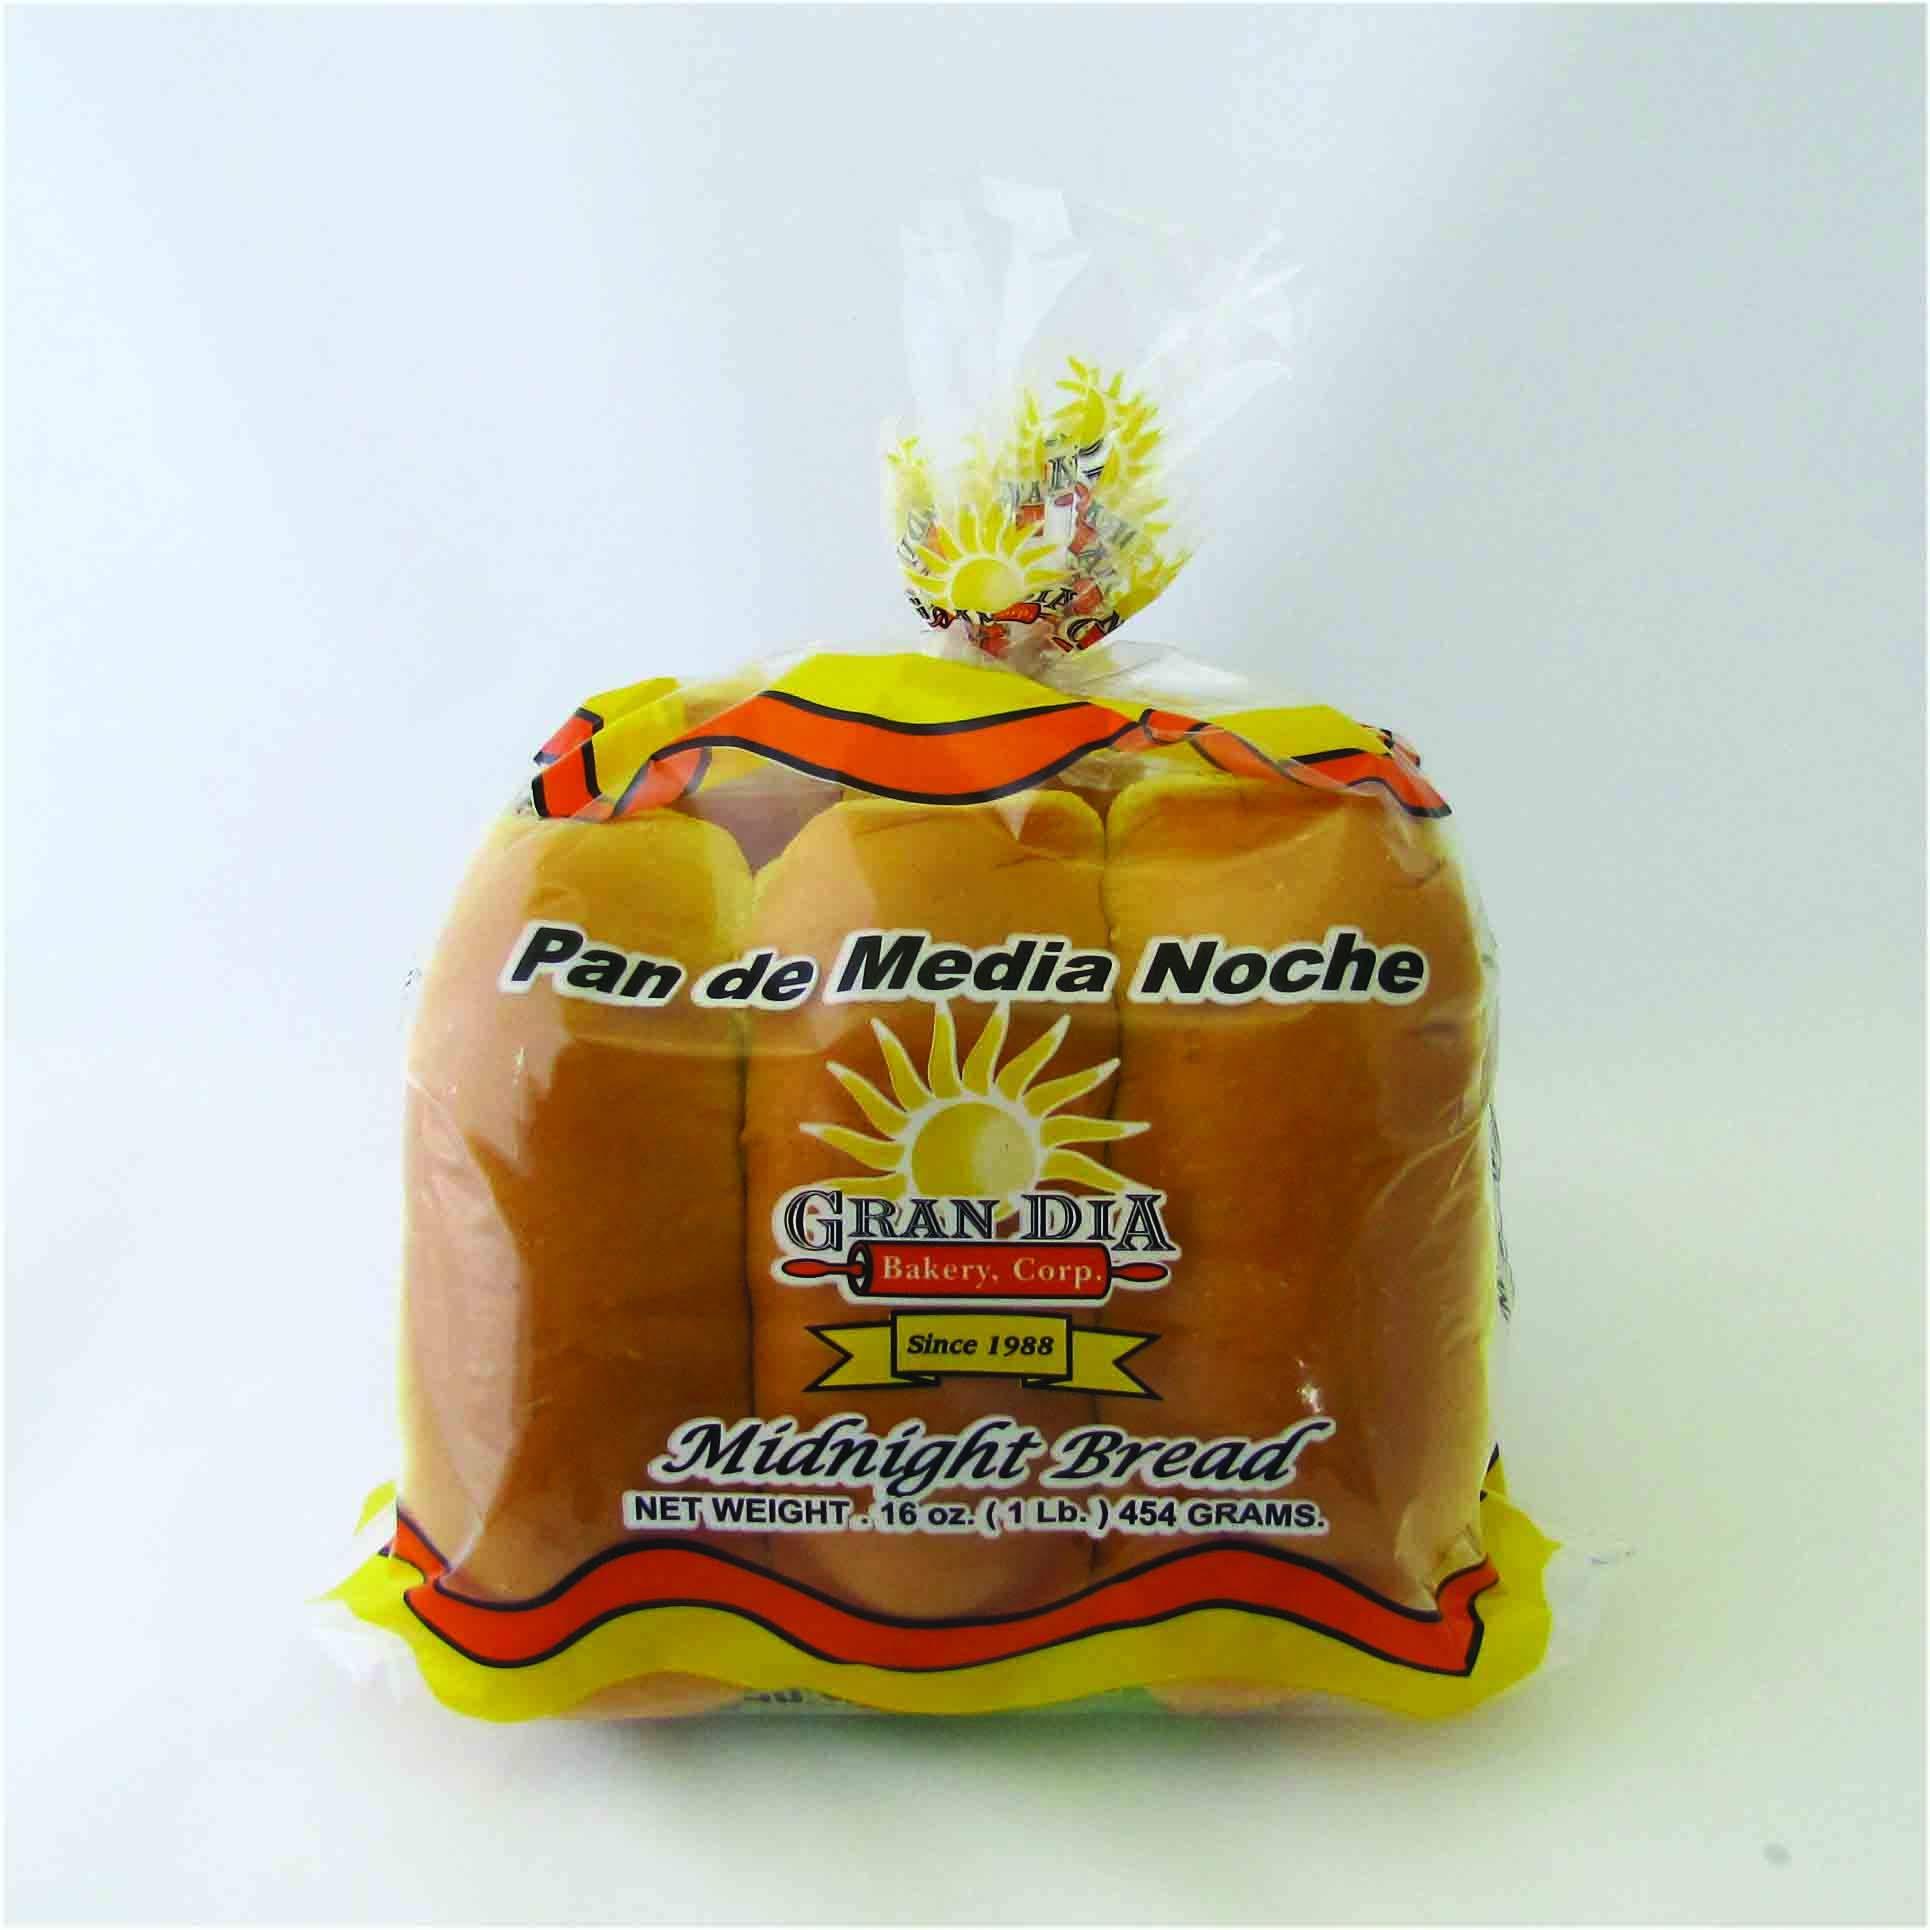 Pan de Media Noche, Midnight Bread, 16oz